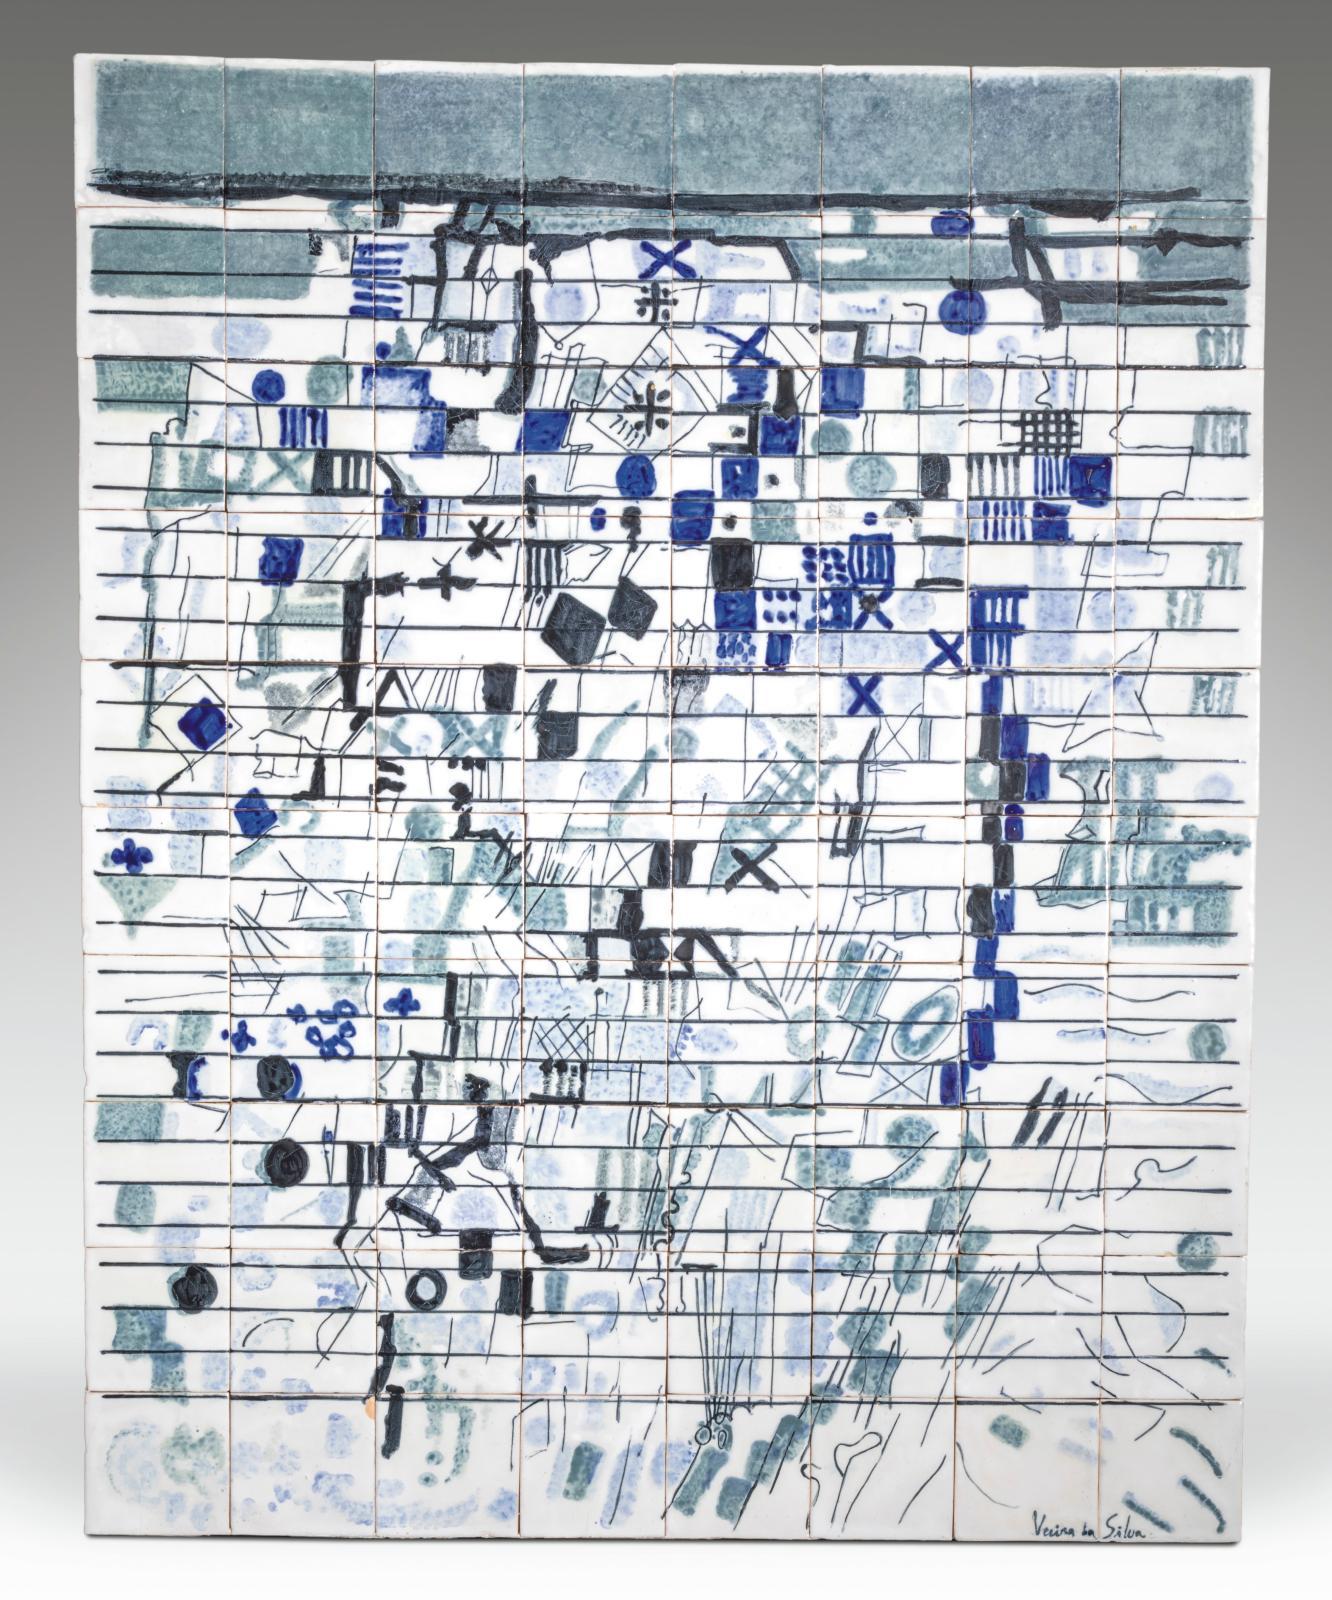 Maria Helena Vieira da Silva (1908-1992), Composition abstraite, panneau d'azulejos, 140x112cm. Estimation: 20000/30000€